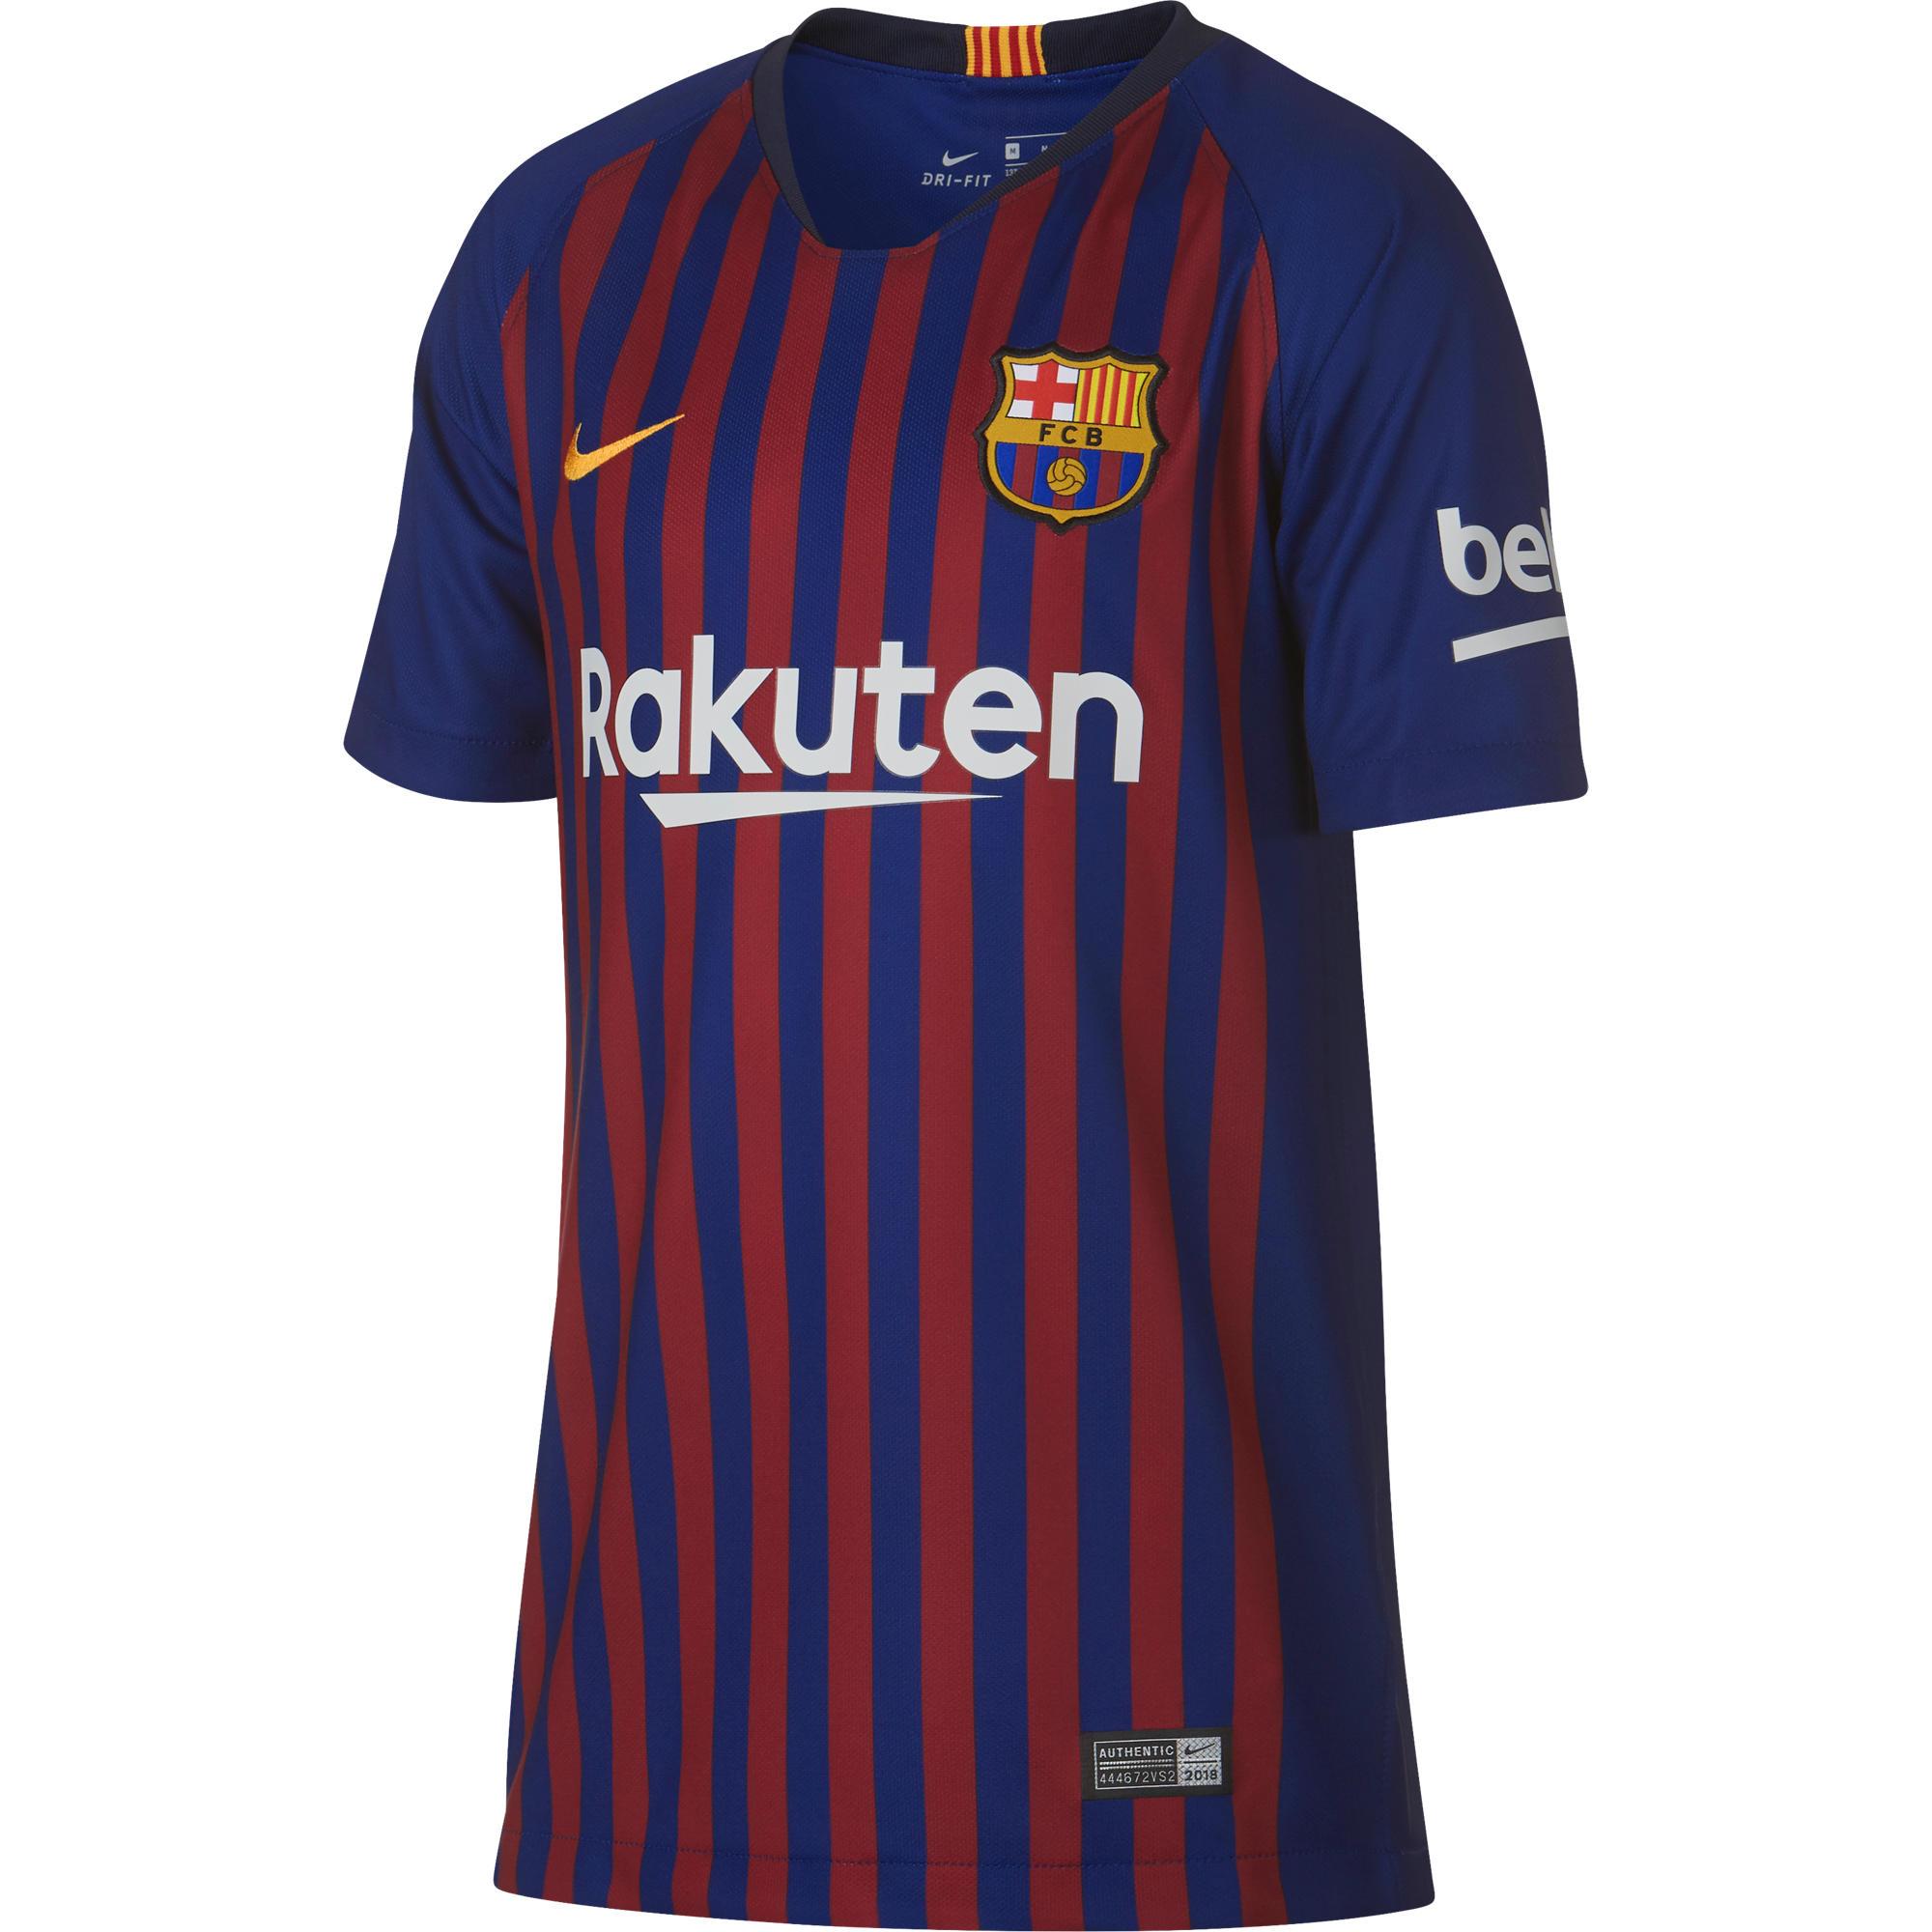 c85fcfb3d Camisetas de Fútbol Réplicas | Decathlon